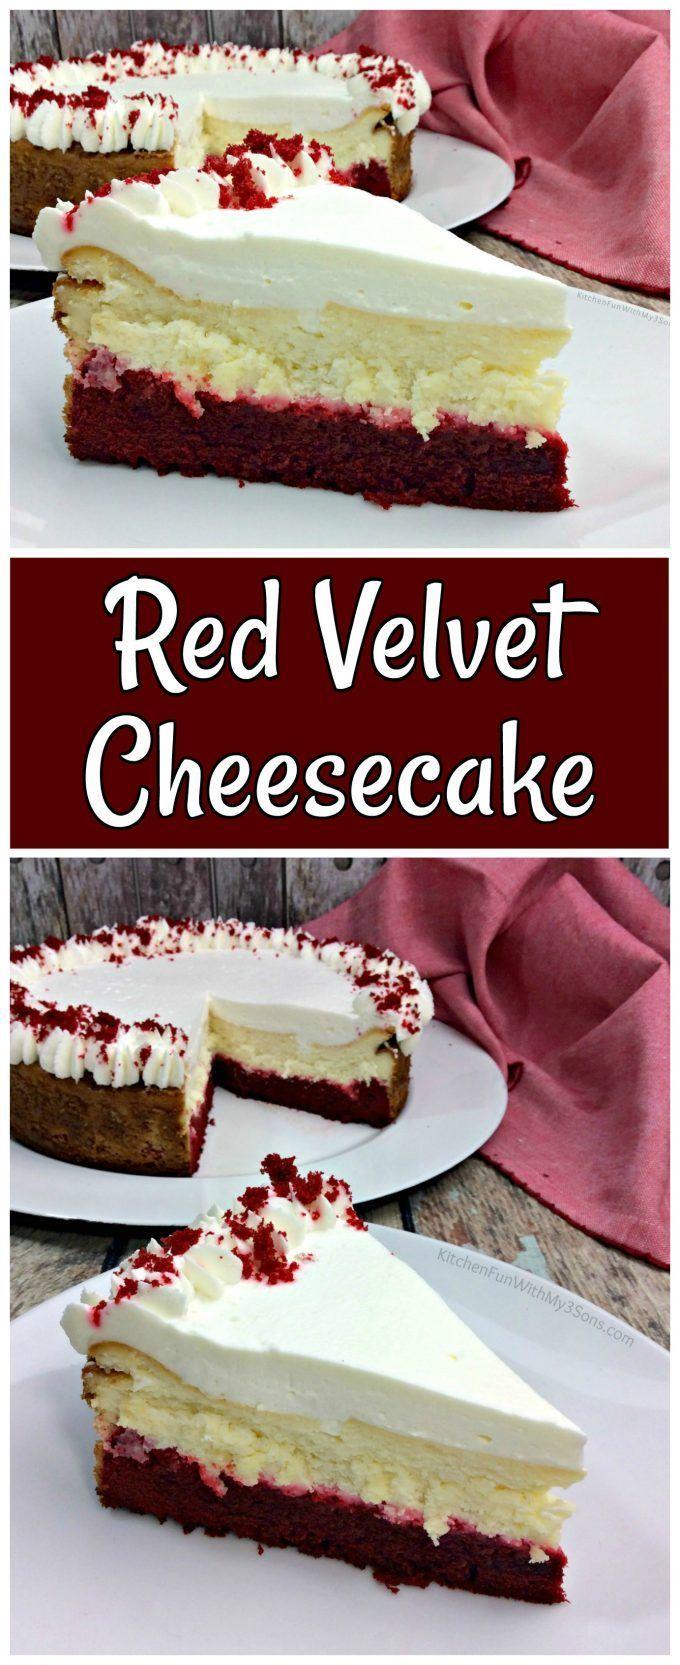 Delicious homemade Red Velvet Cheesecake recipe. #cheesecake #redvelvet